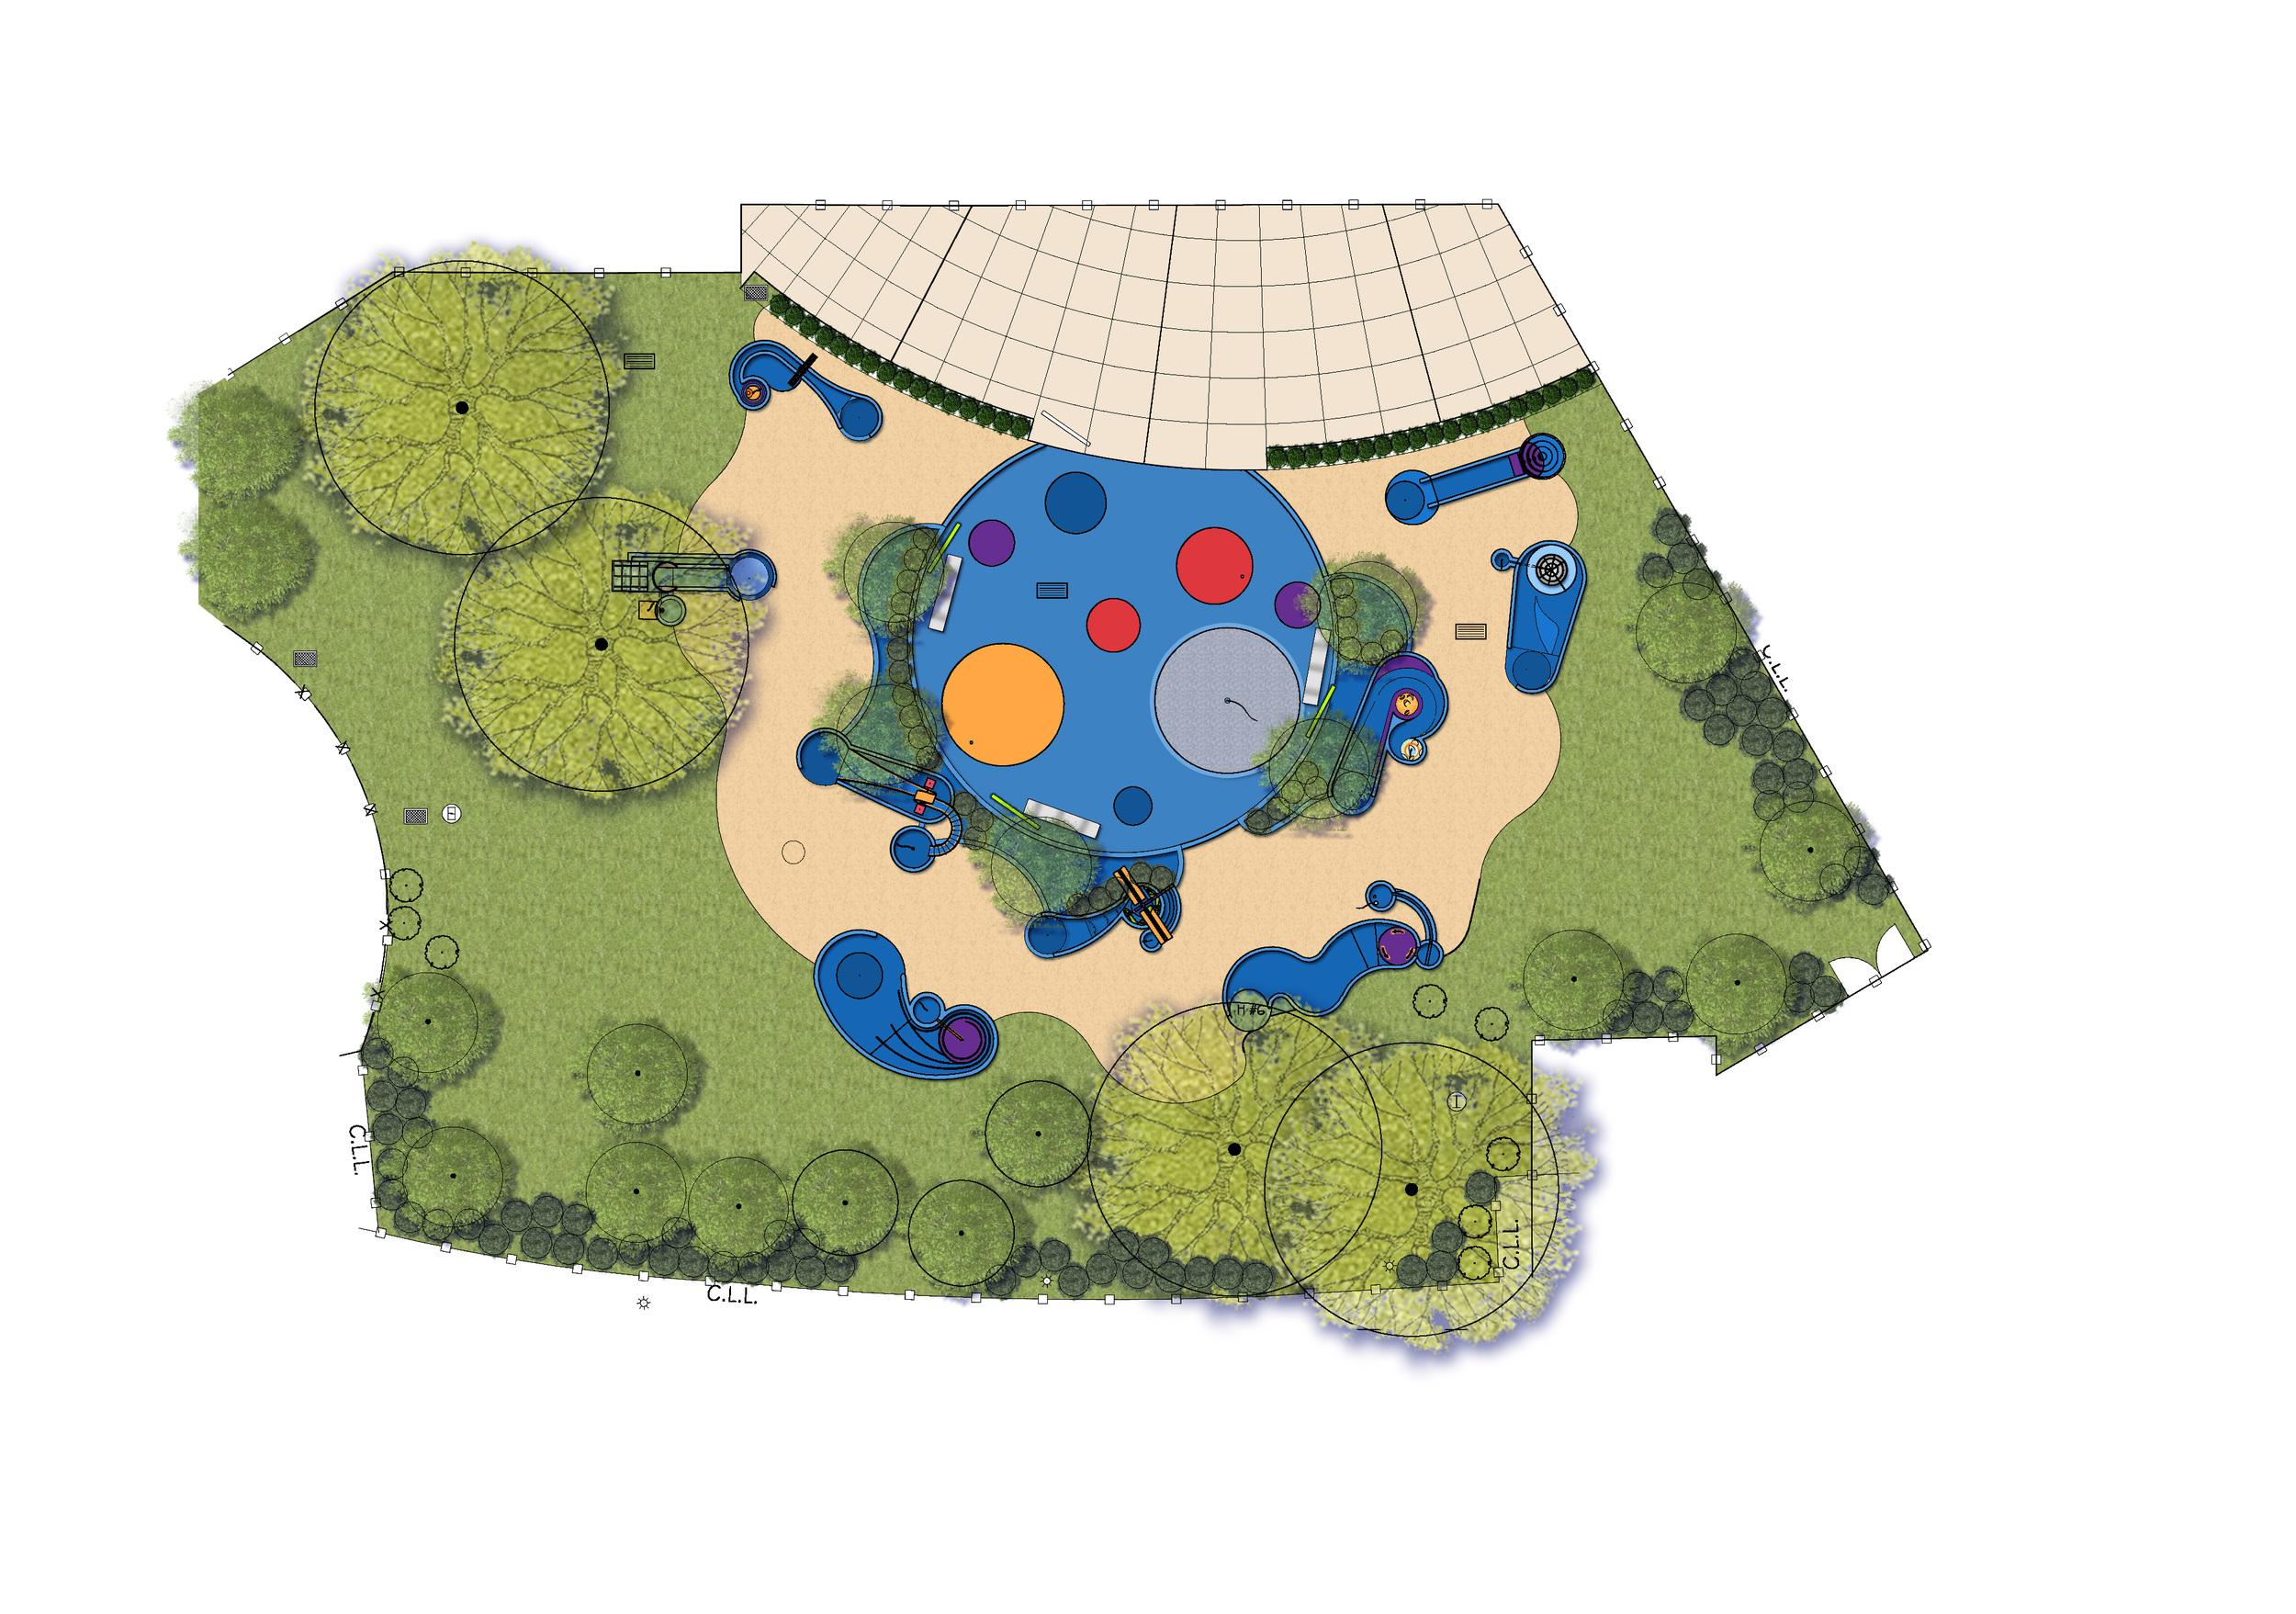 rocket park plan for website.jpg